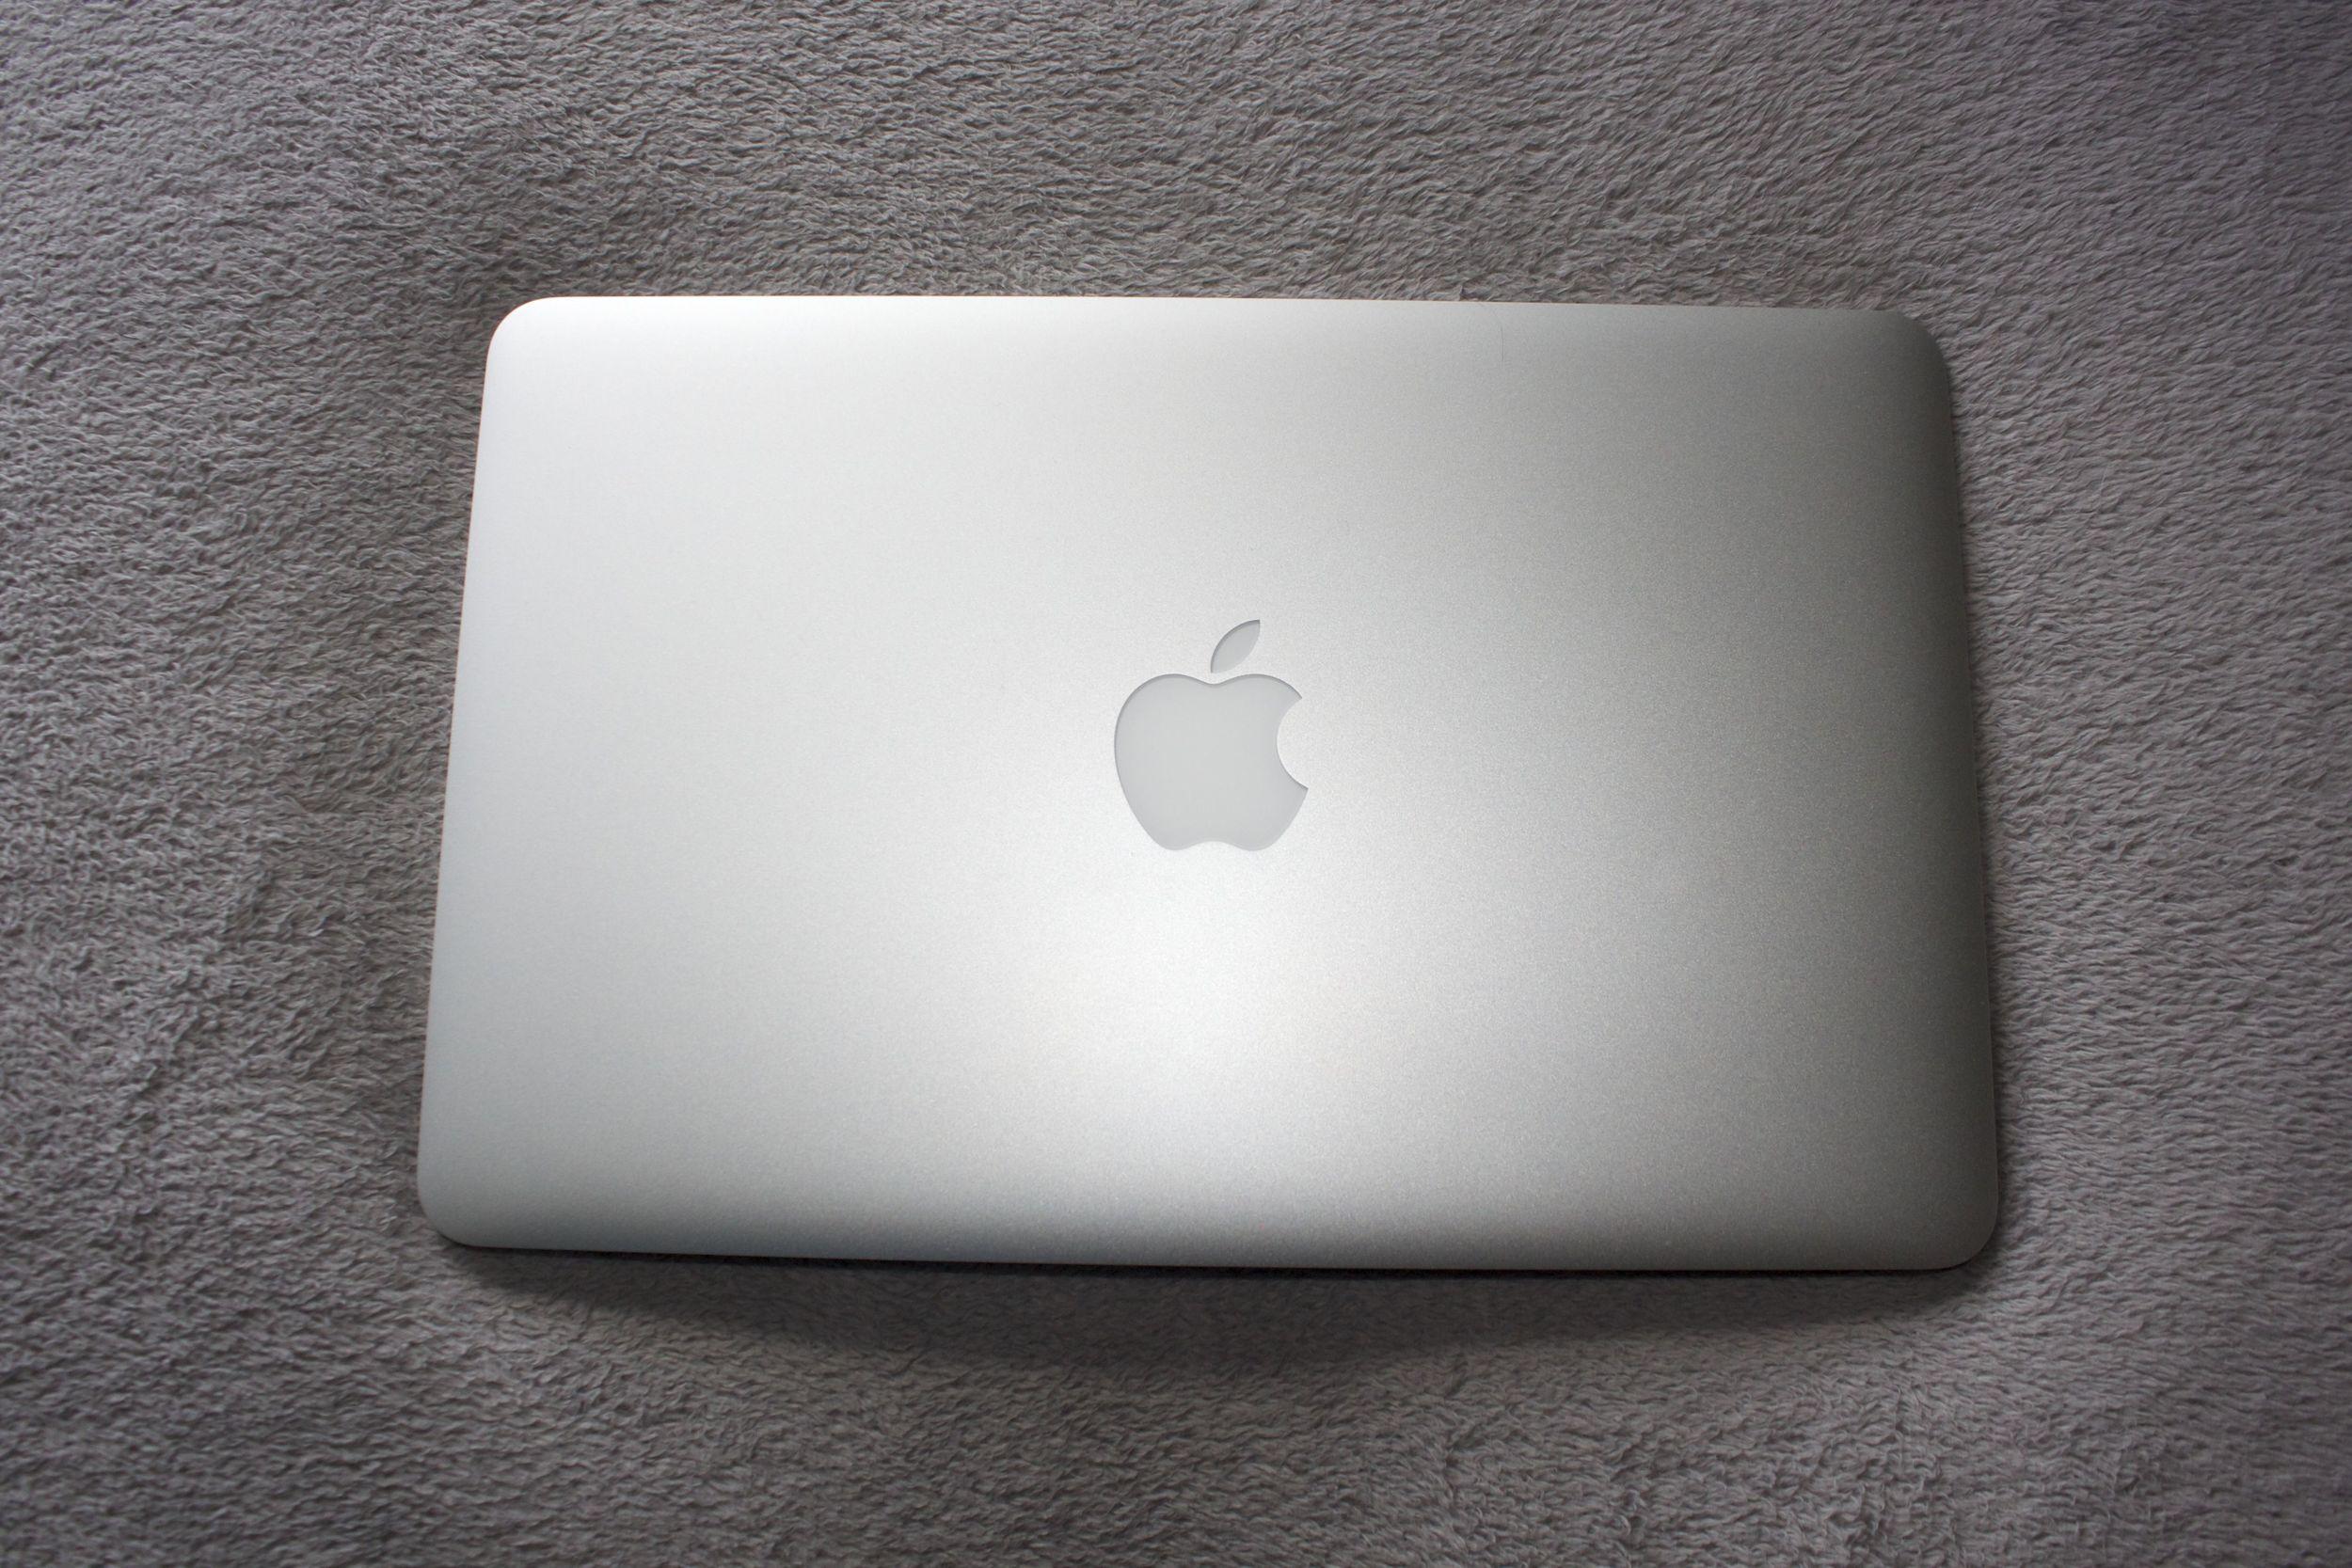 My trusty MacBook Air. It's love